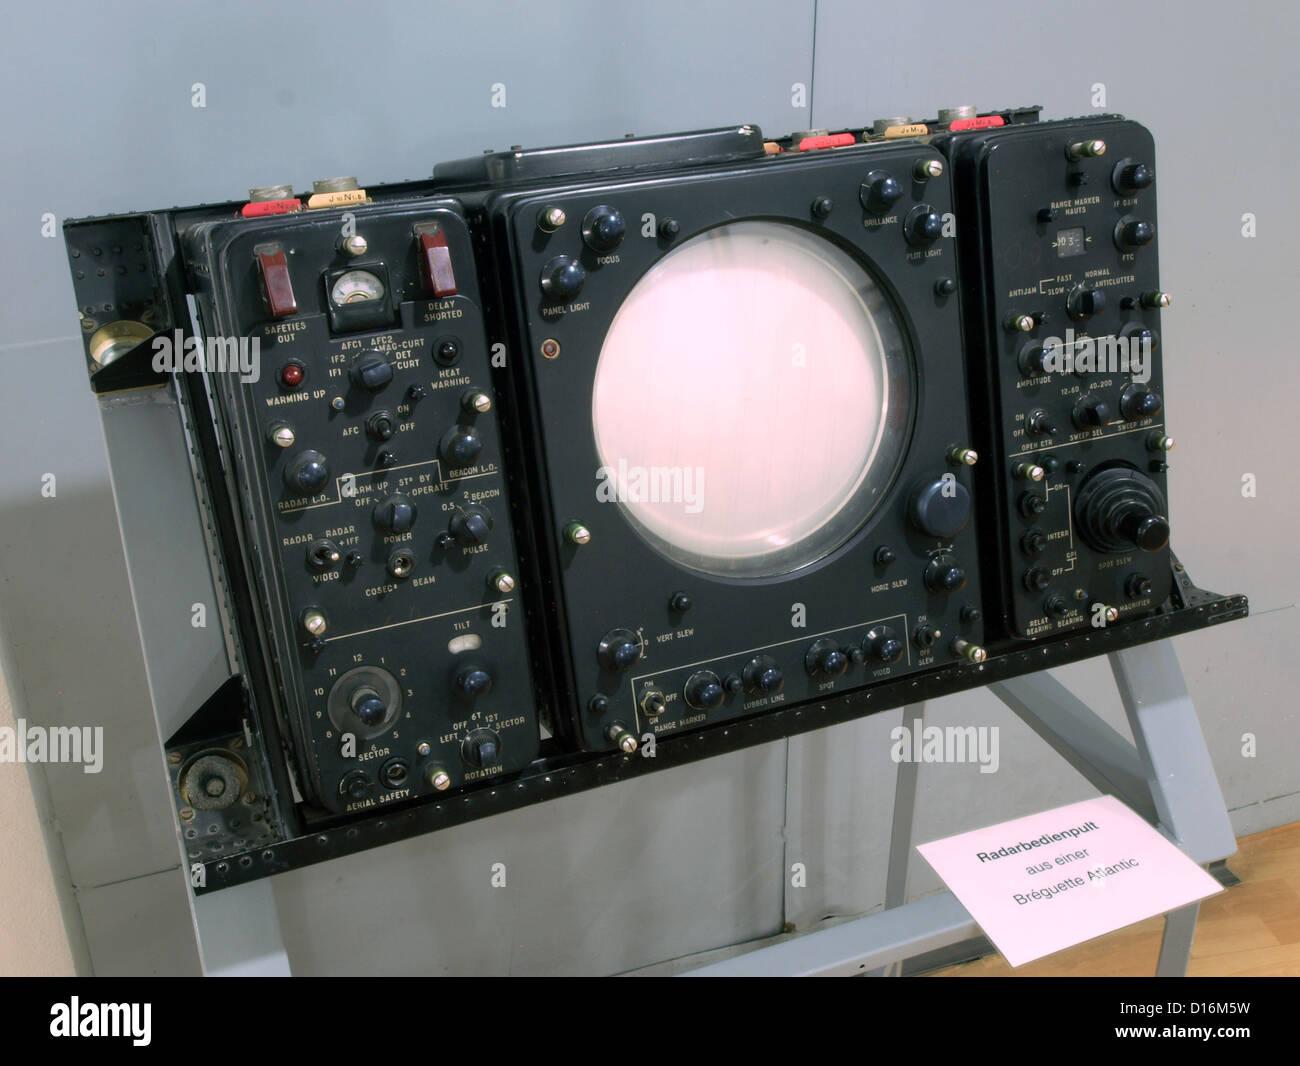 Museum of Aviation and Technology Wernigerode.Radar scope panel of a Breguet Atlantique - Stock Image